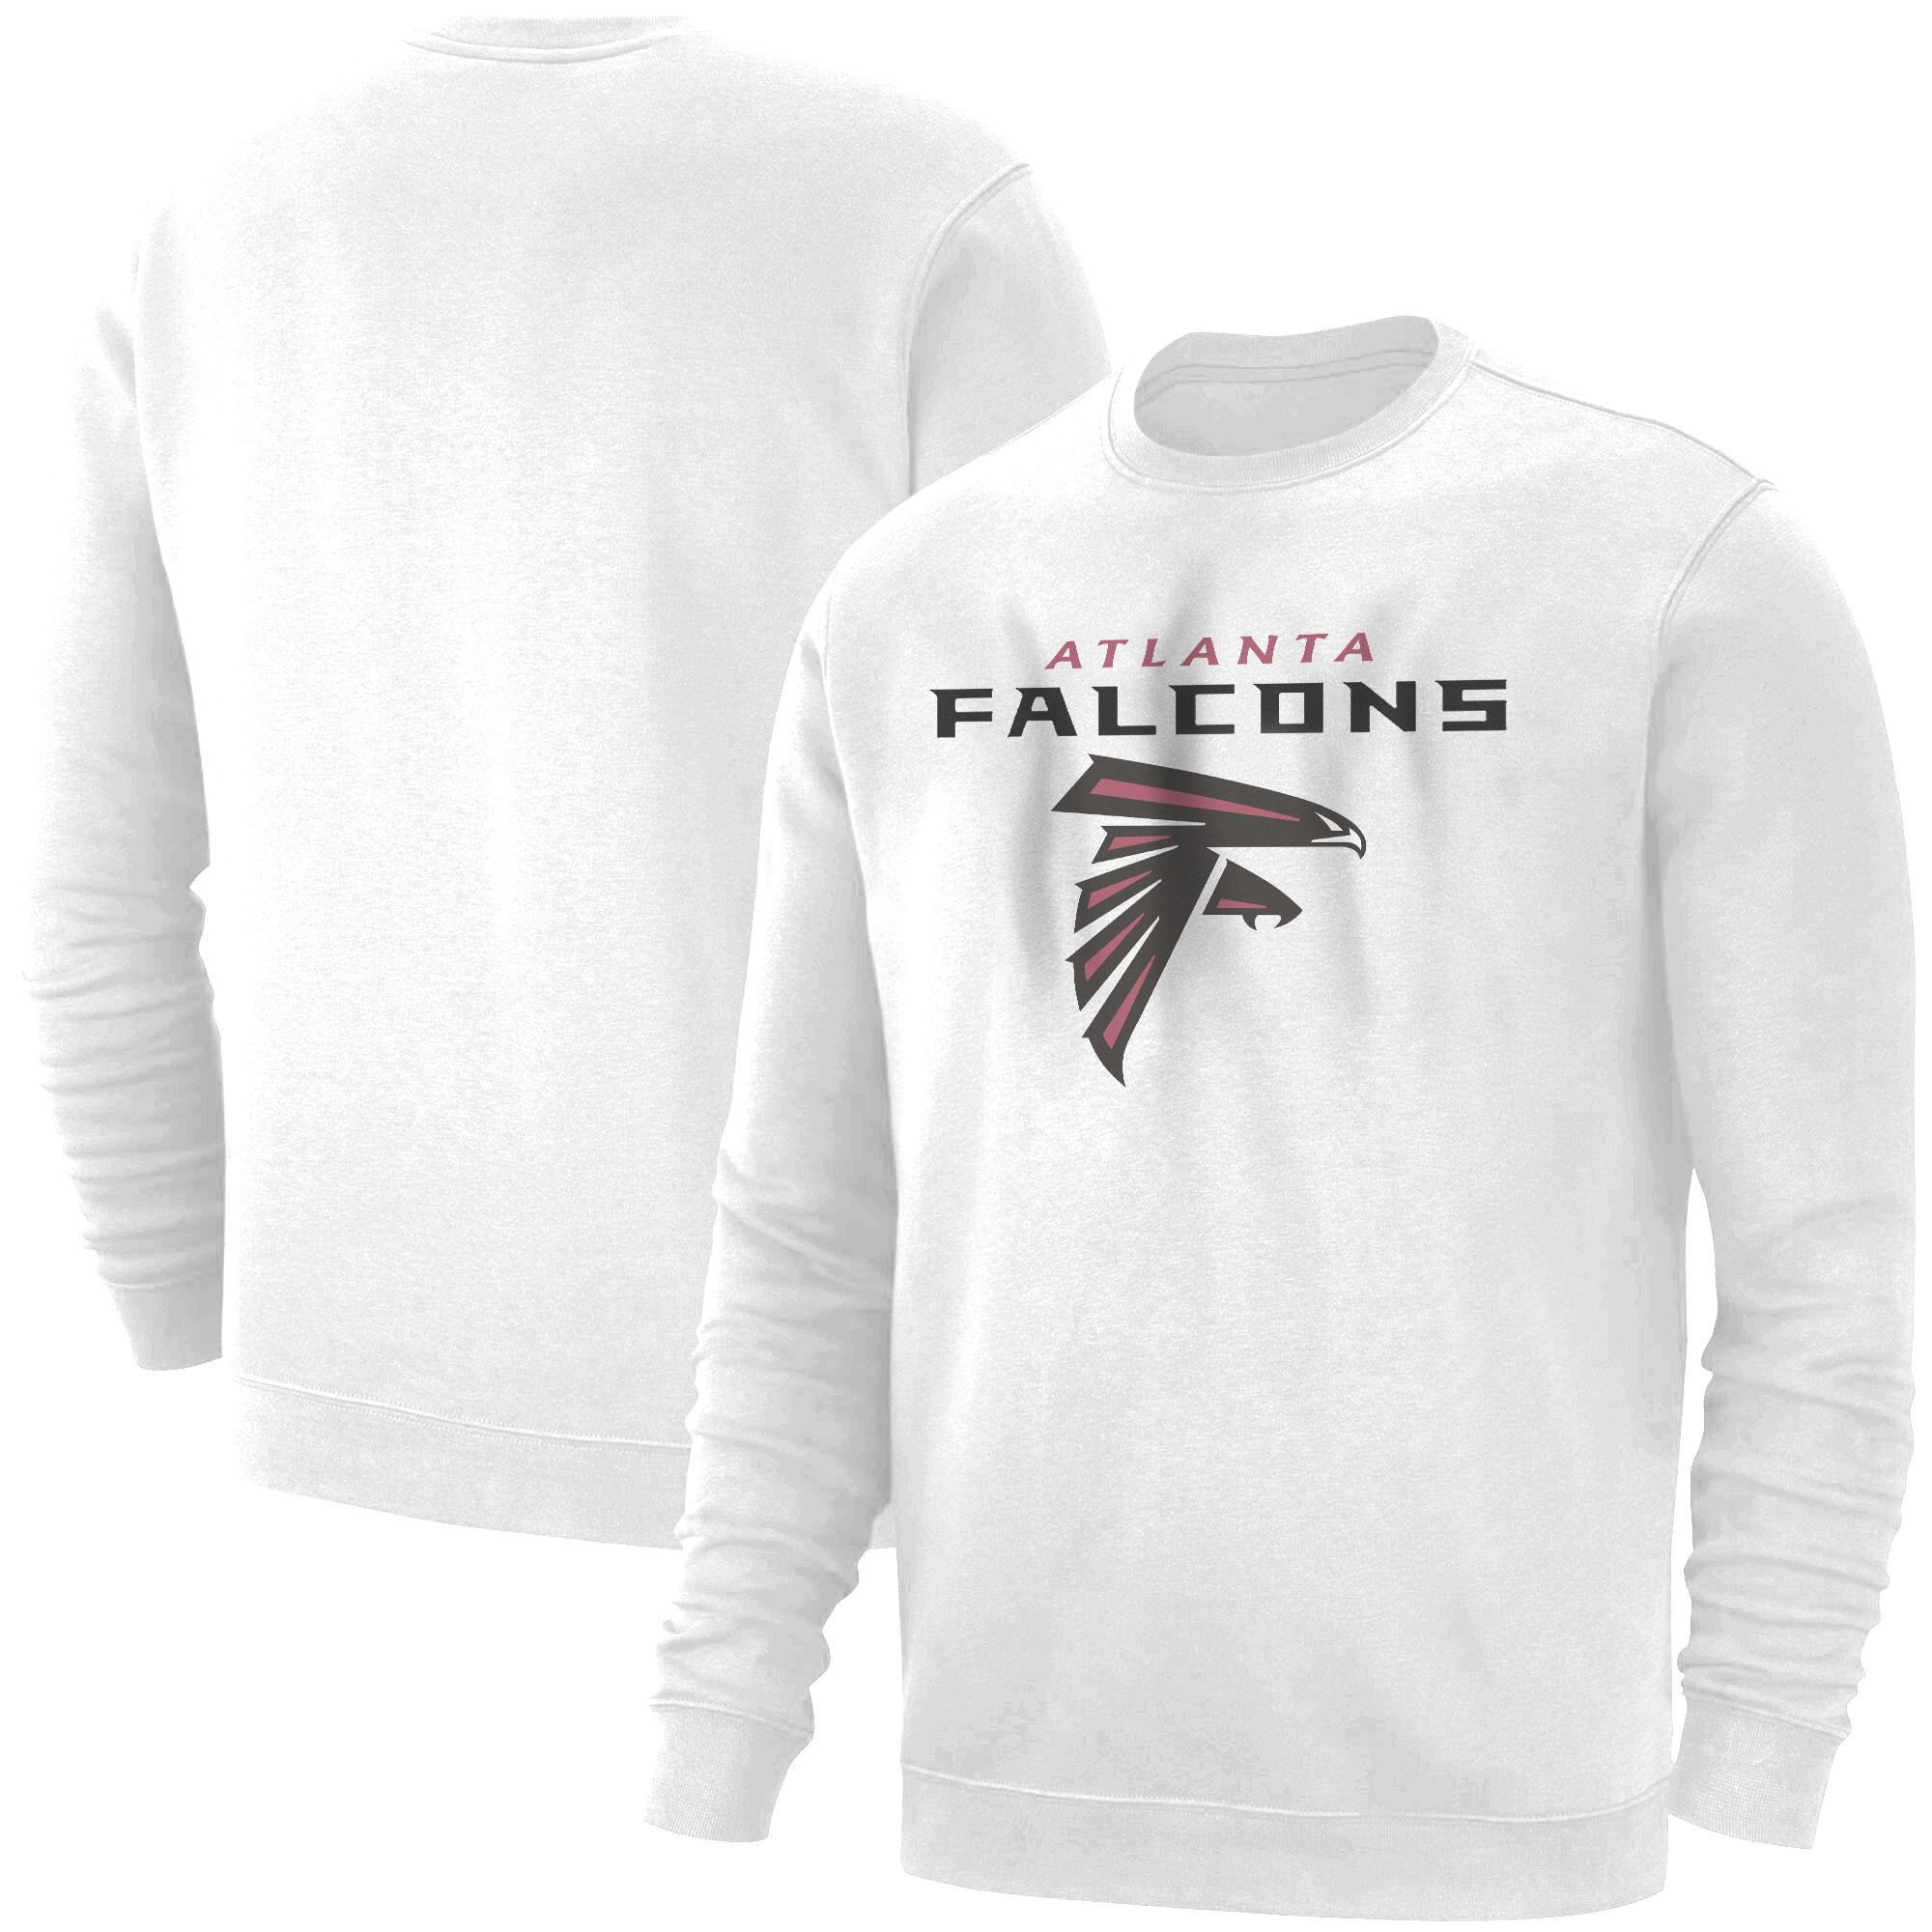 Atlanta Falcons Basic (BSC-WHT-NP-375-ATL.FALCONS)